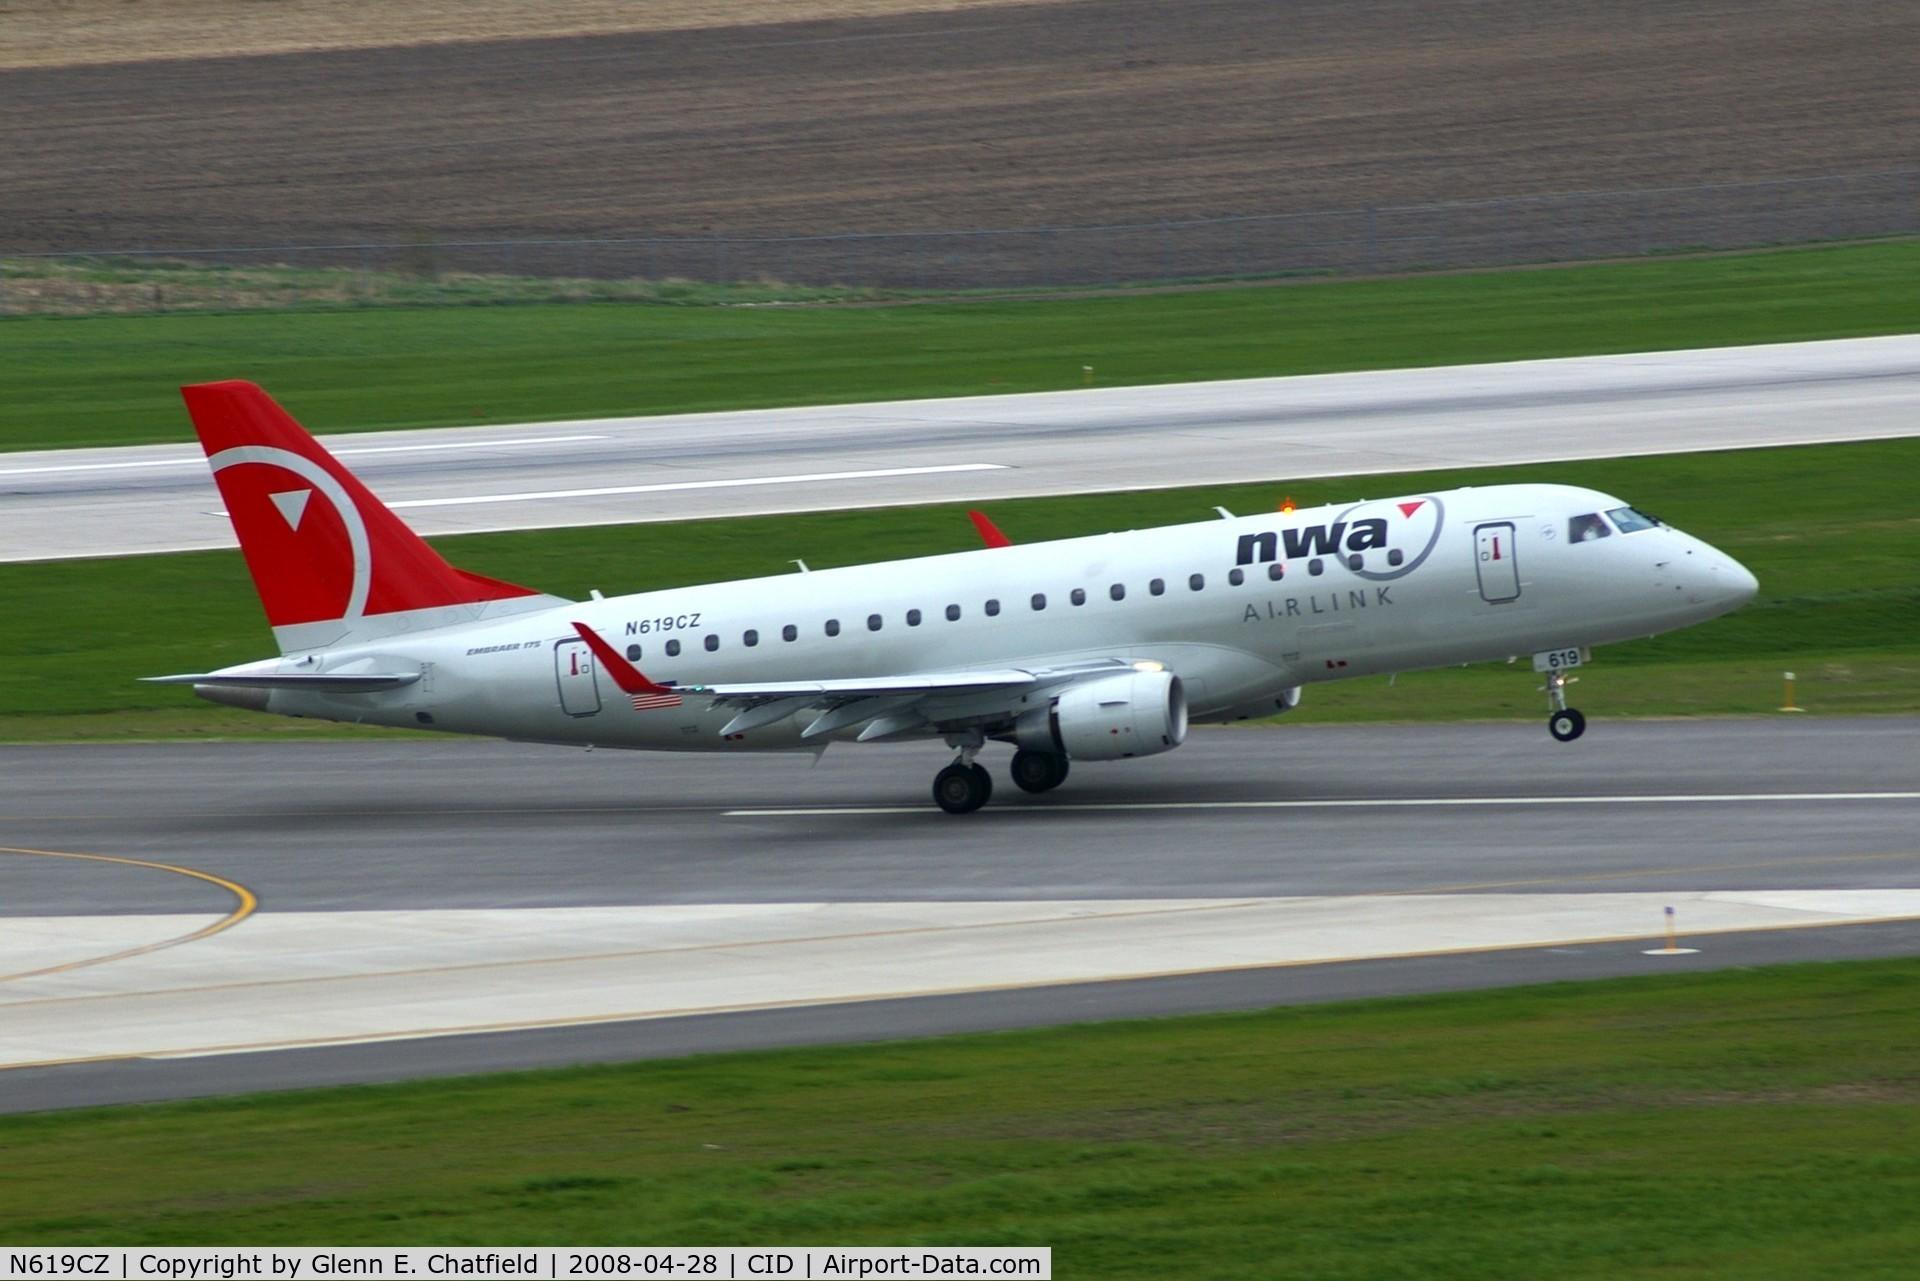 N619CZ, 2008 Embraer 175LR (ERJ-170-200LR) C/N 17000213, Rotating on take off roll runway 31